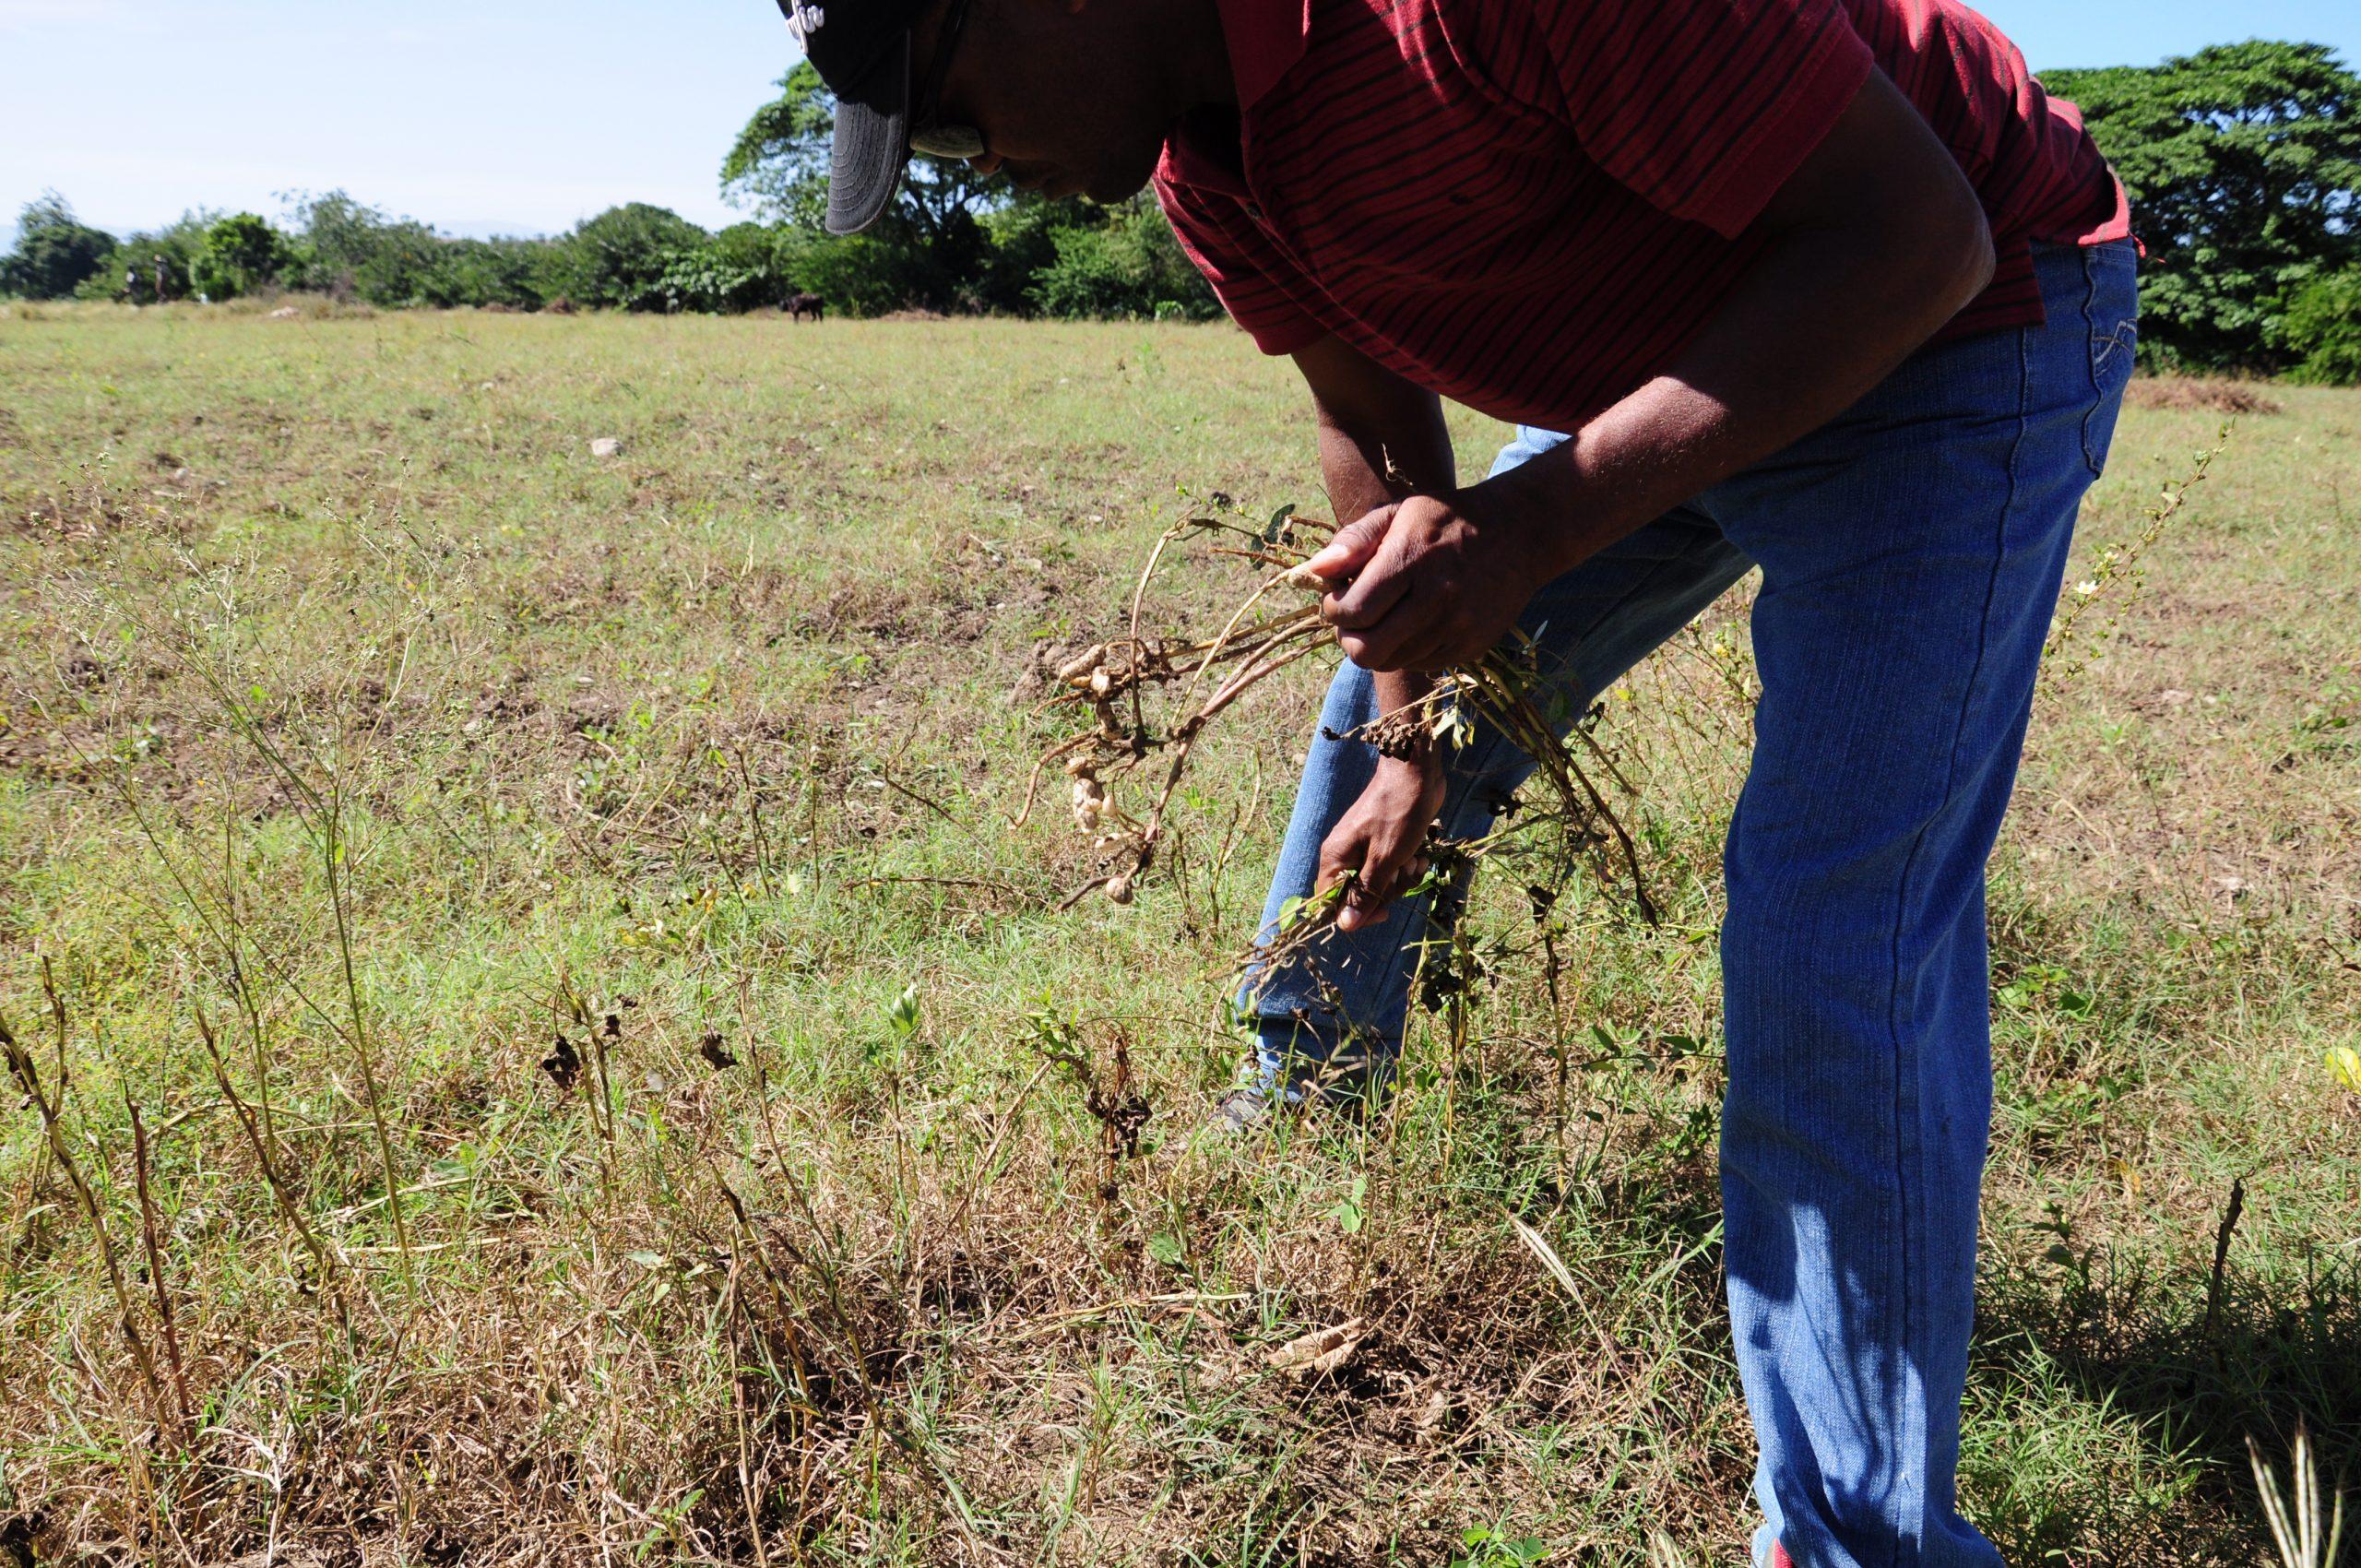 Haiti's rising food insecurity risks social tension, says FAO